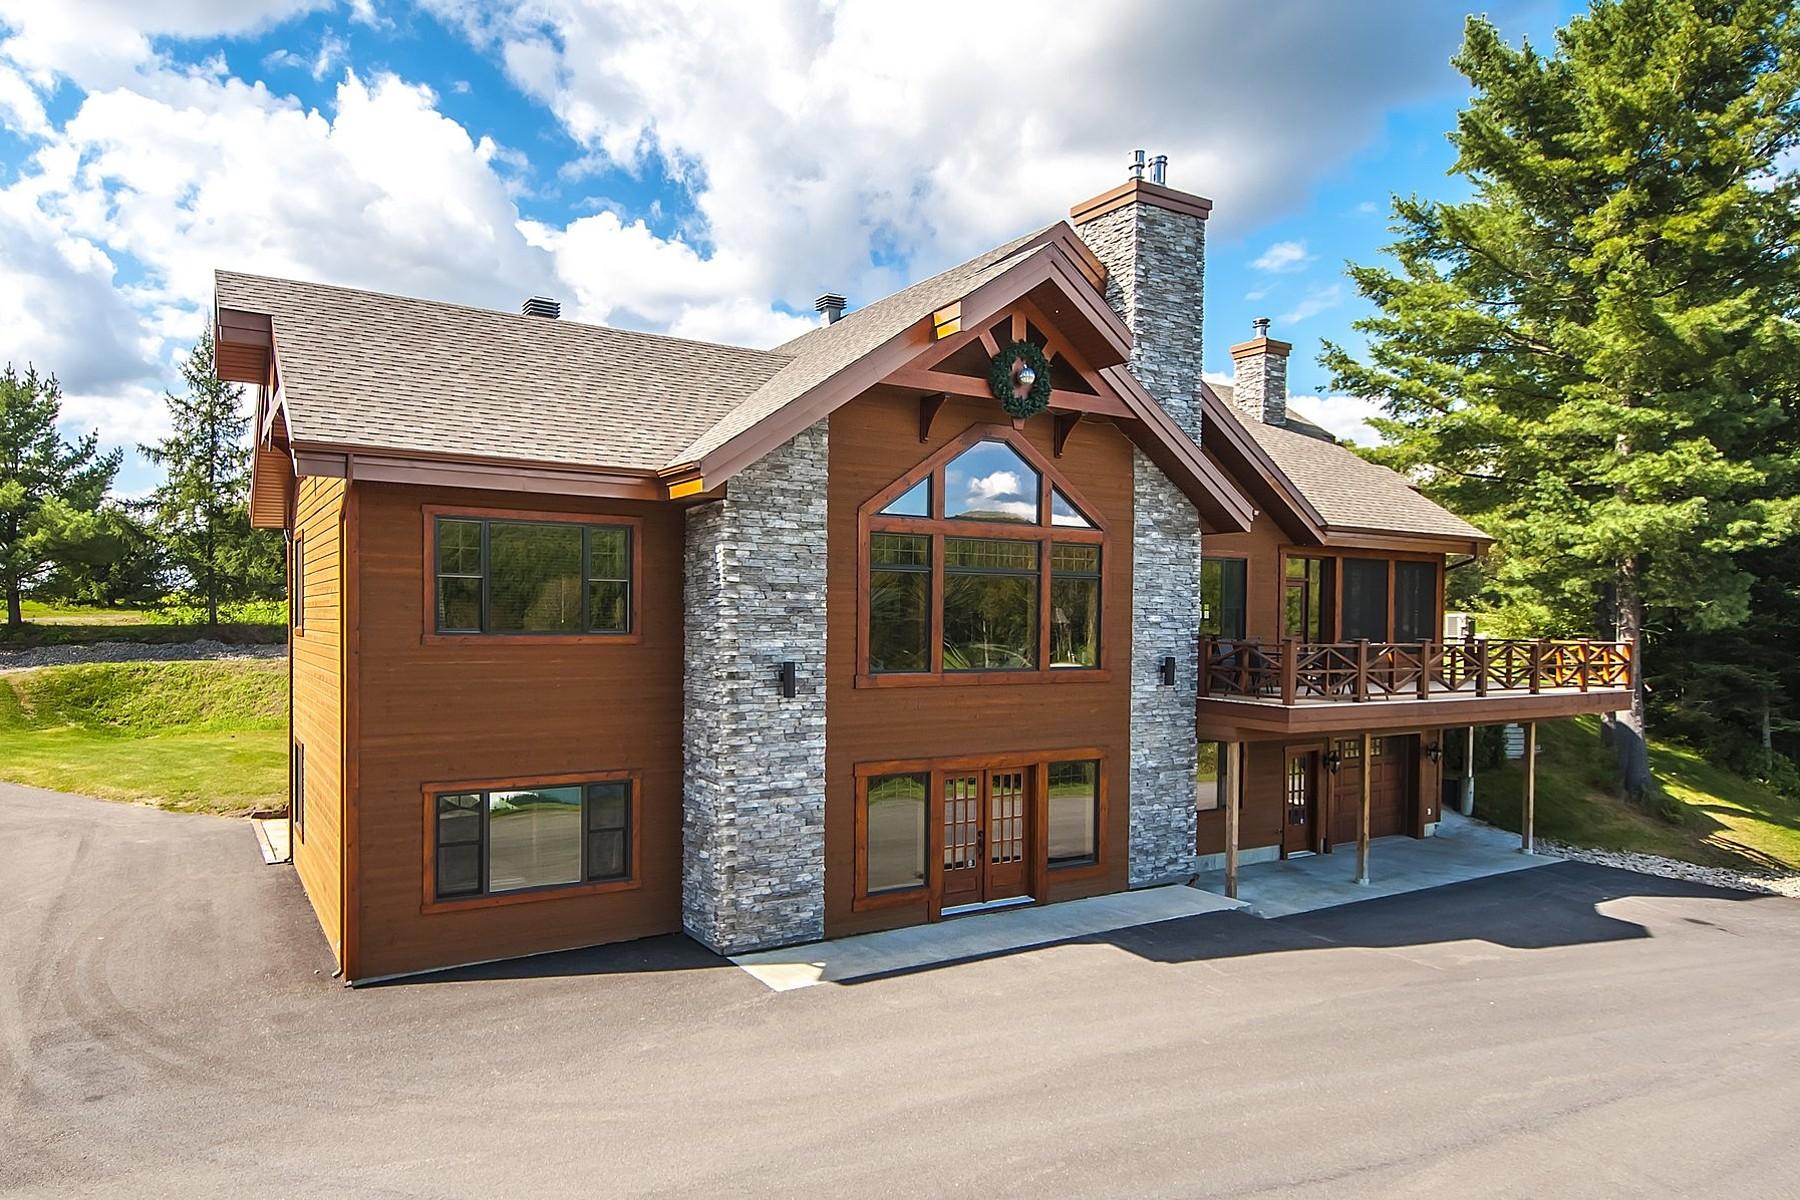 Частный односемейный дом для того Продажа на Saint-Raymond, Capitale-Nationale 840 Grande Ligne, Saint-Raymond, Квебек, G3L2Z2 Канада